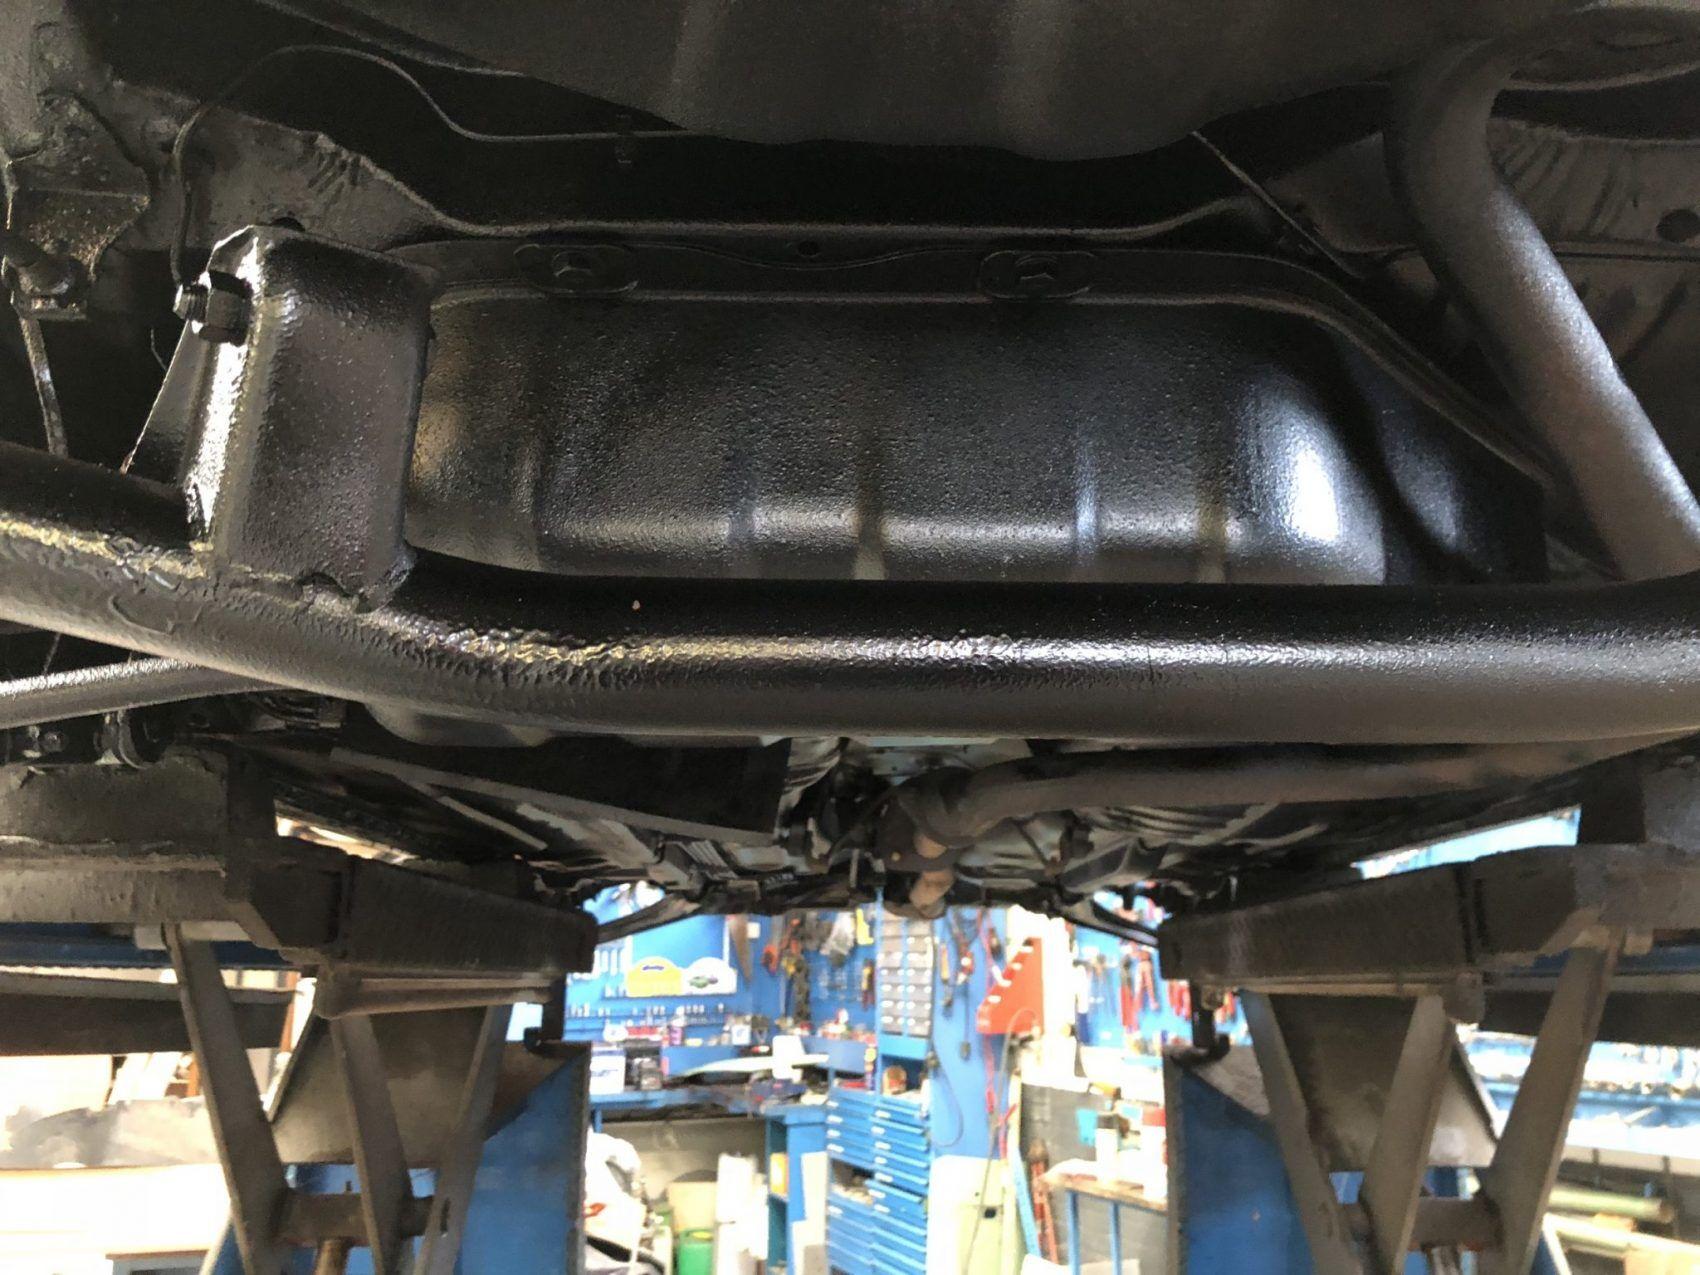 Nissan Figaro - Underbody coating